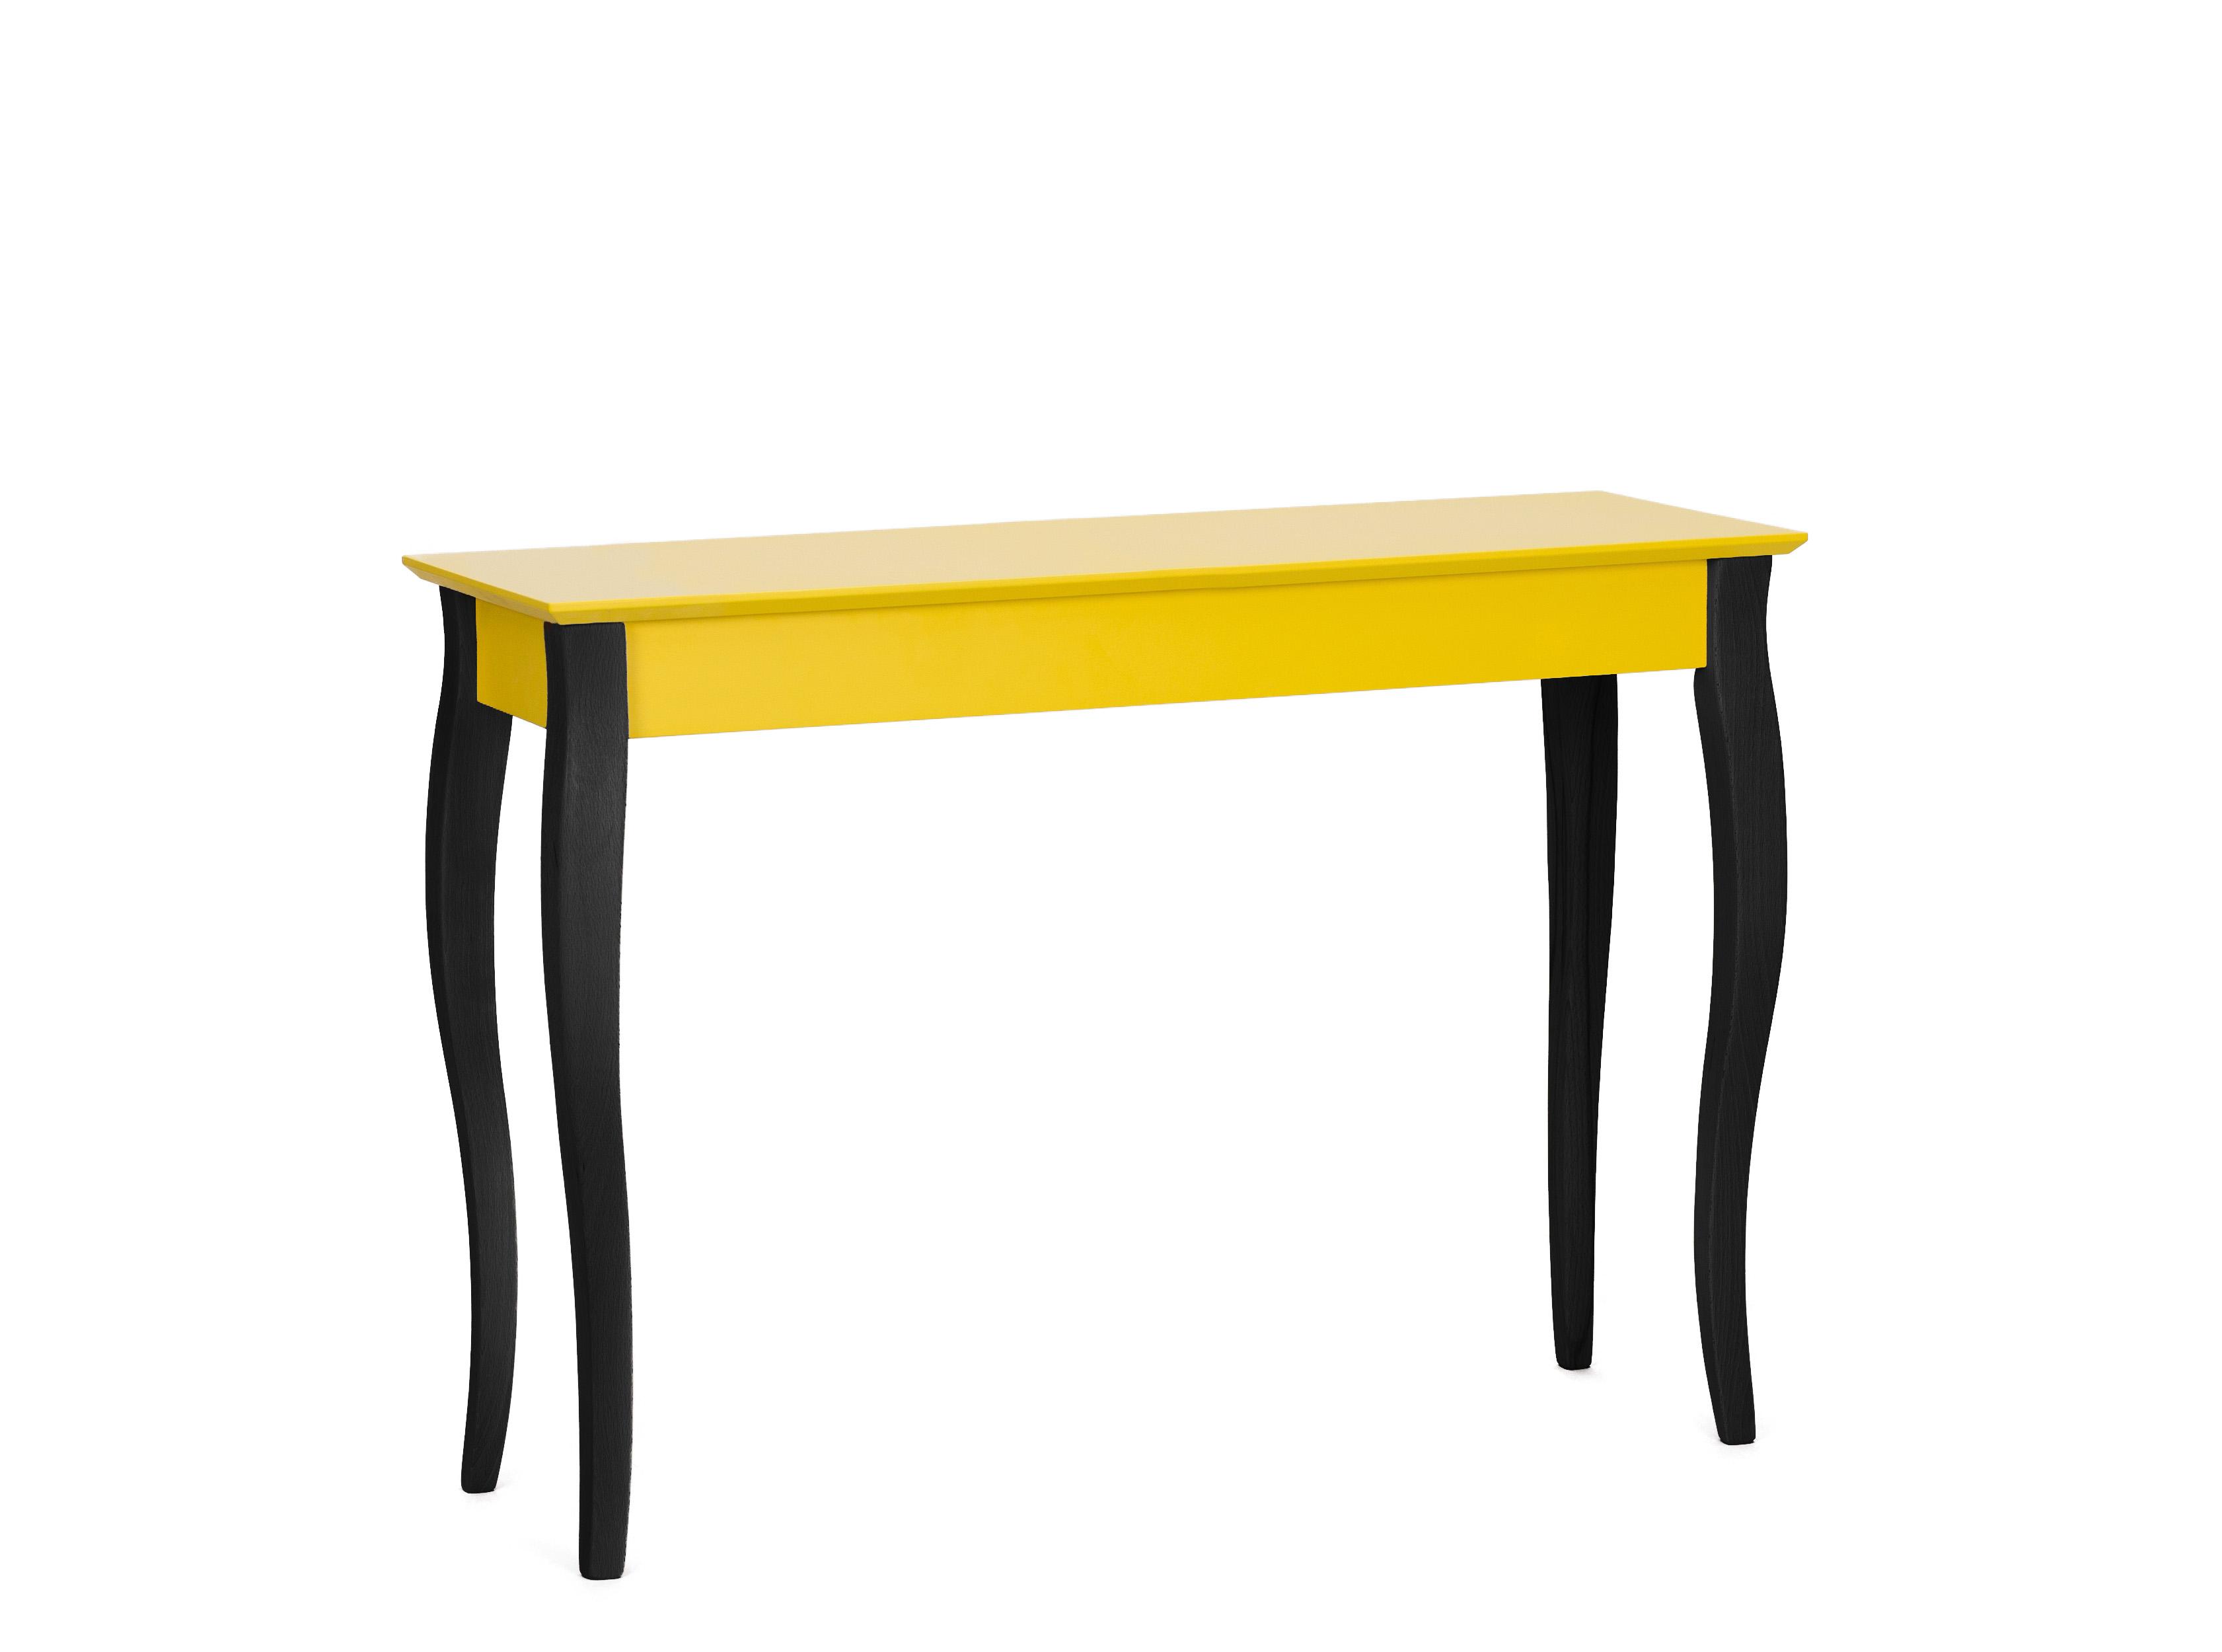 Consola Lillo Large Yellow / Black, L105xl40xh74 cm